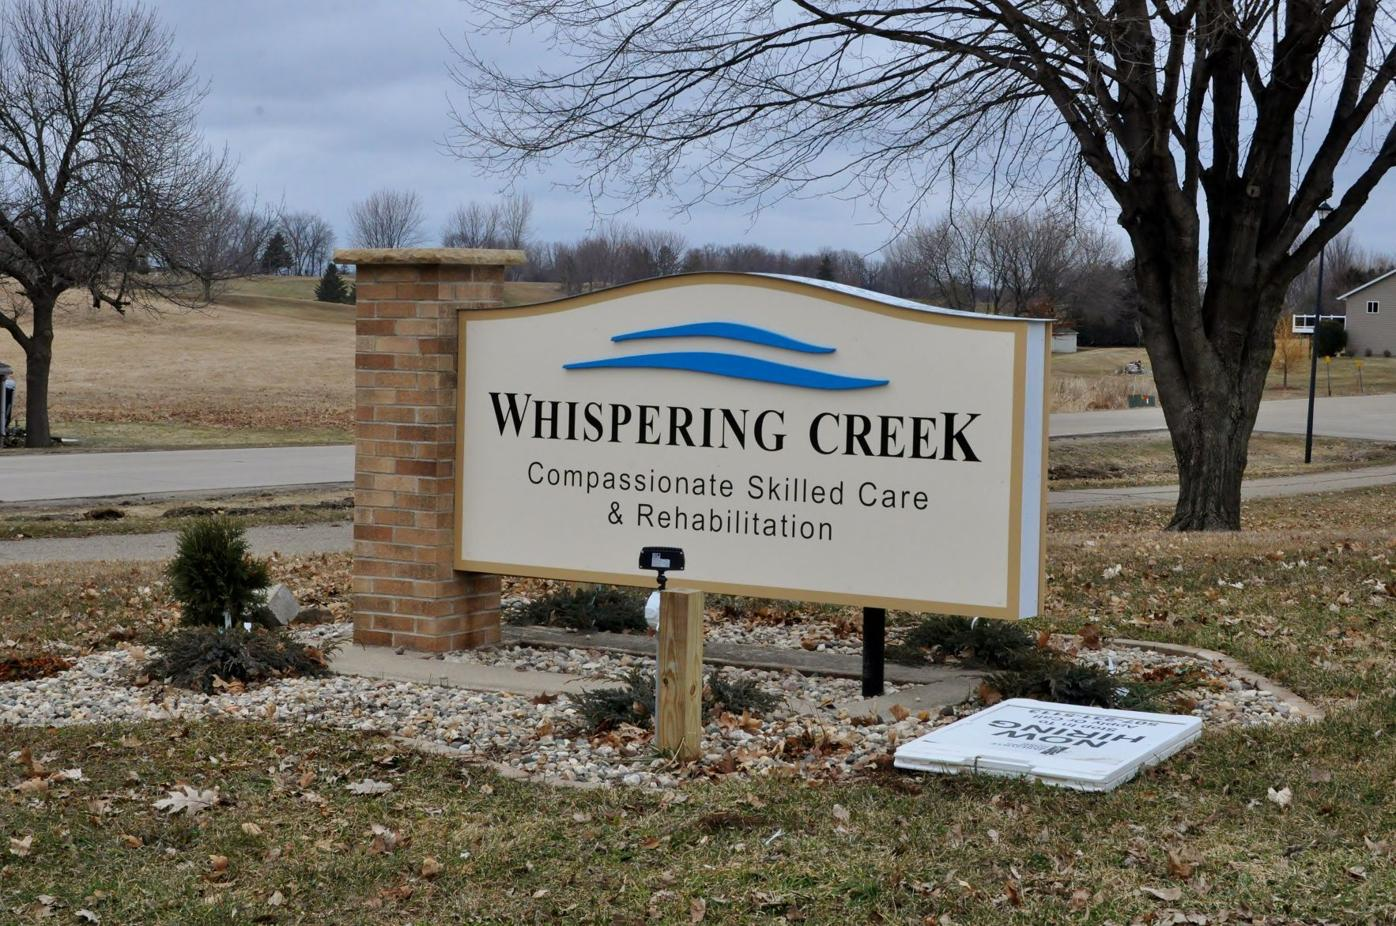 Whispering creek (copy)